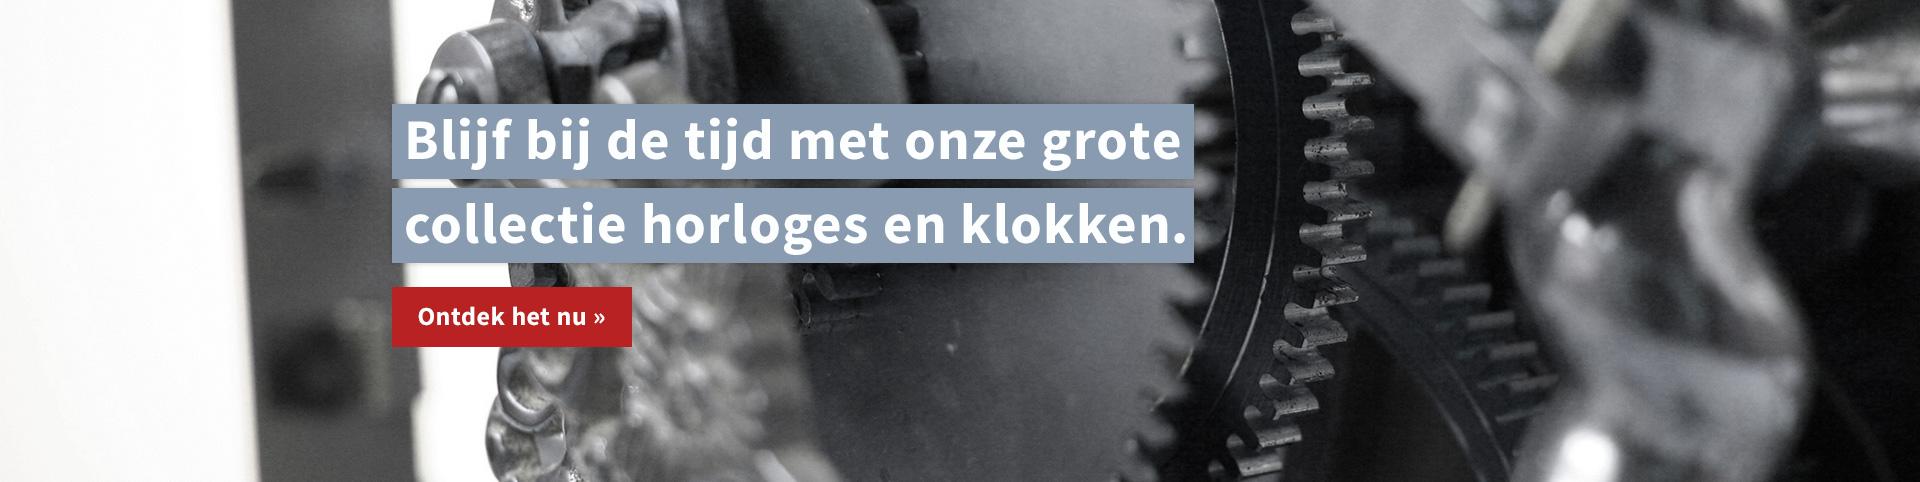 005_UhrWelt_1920x482_nl